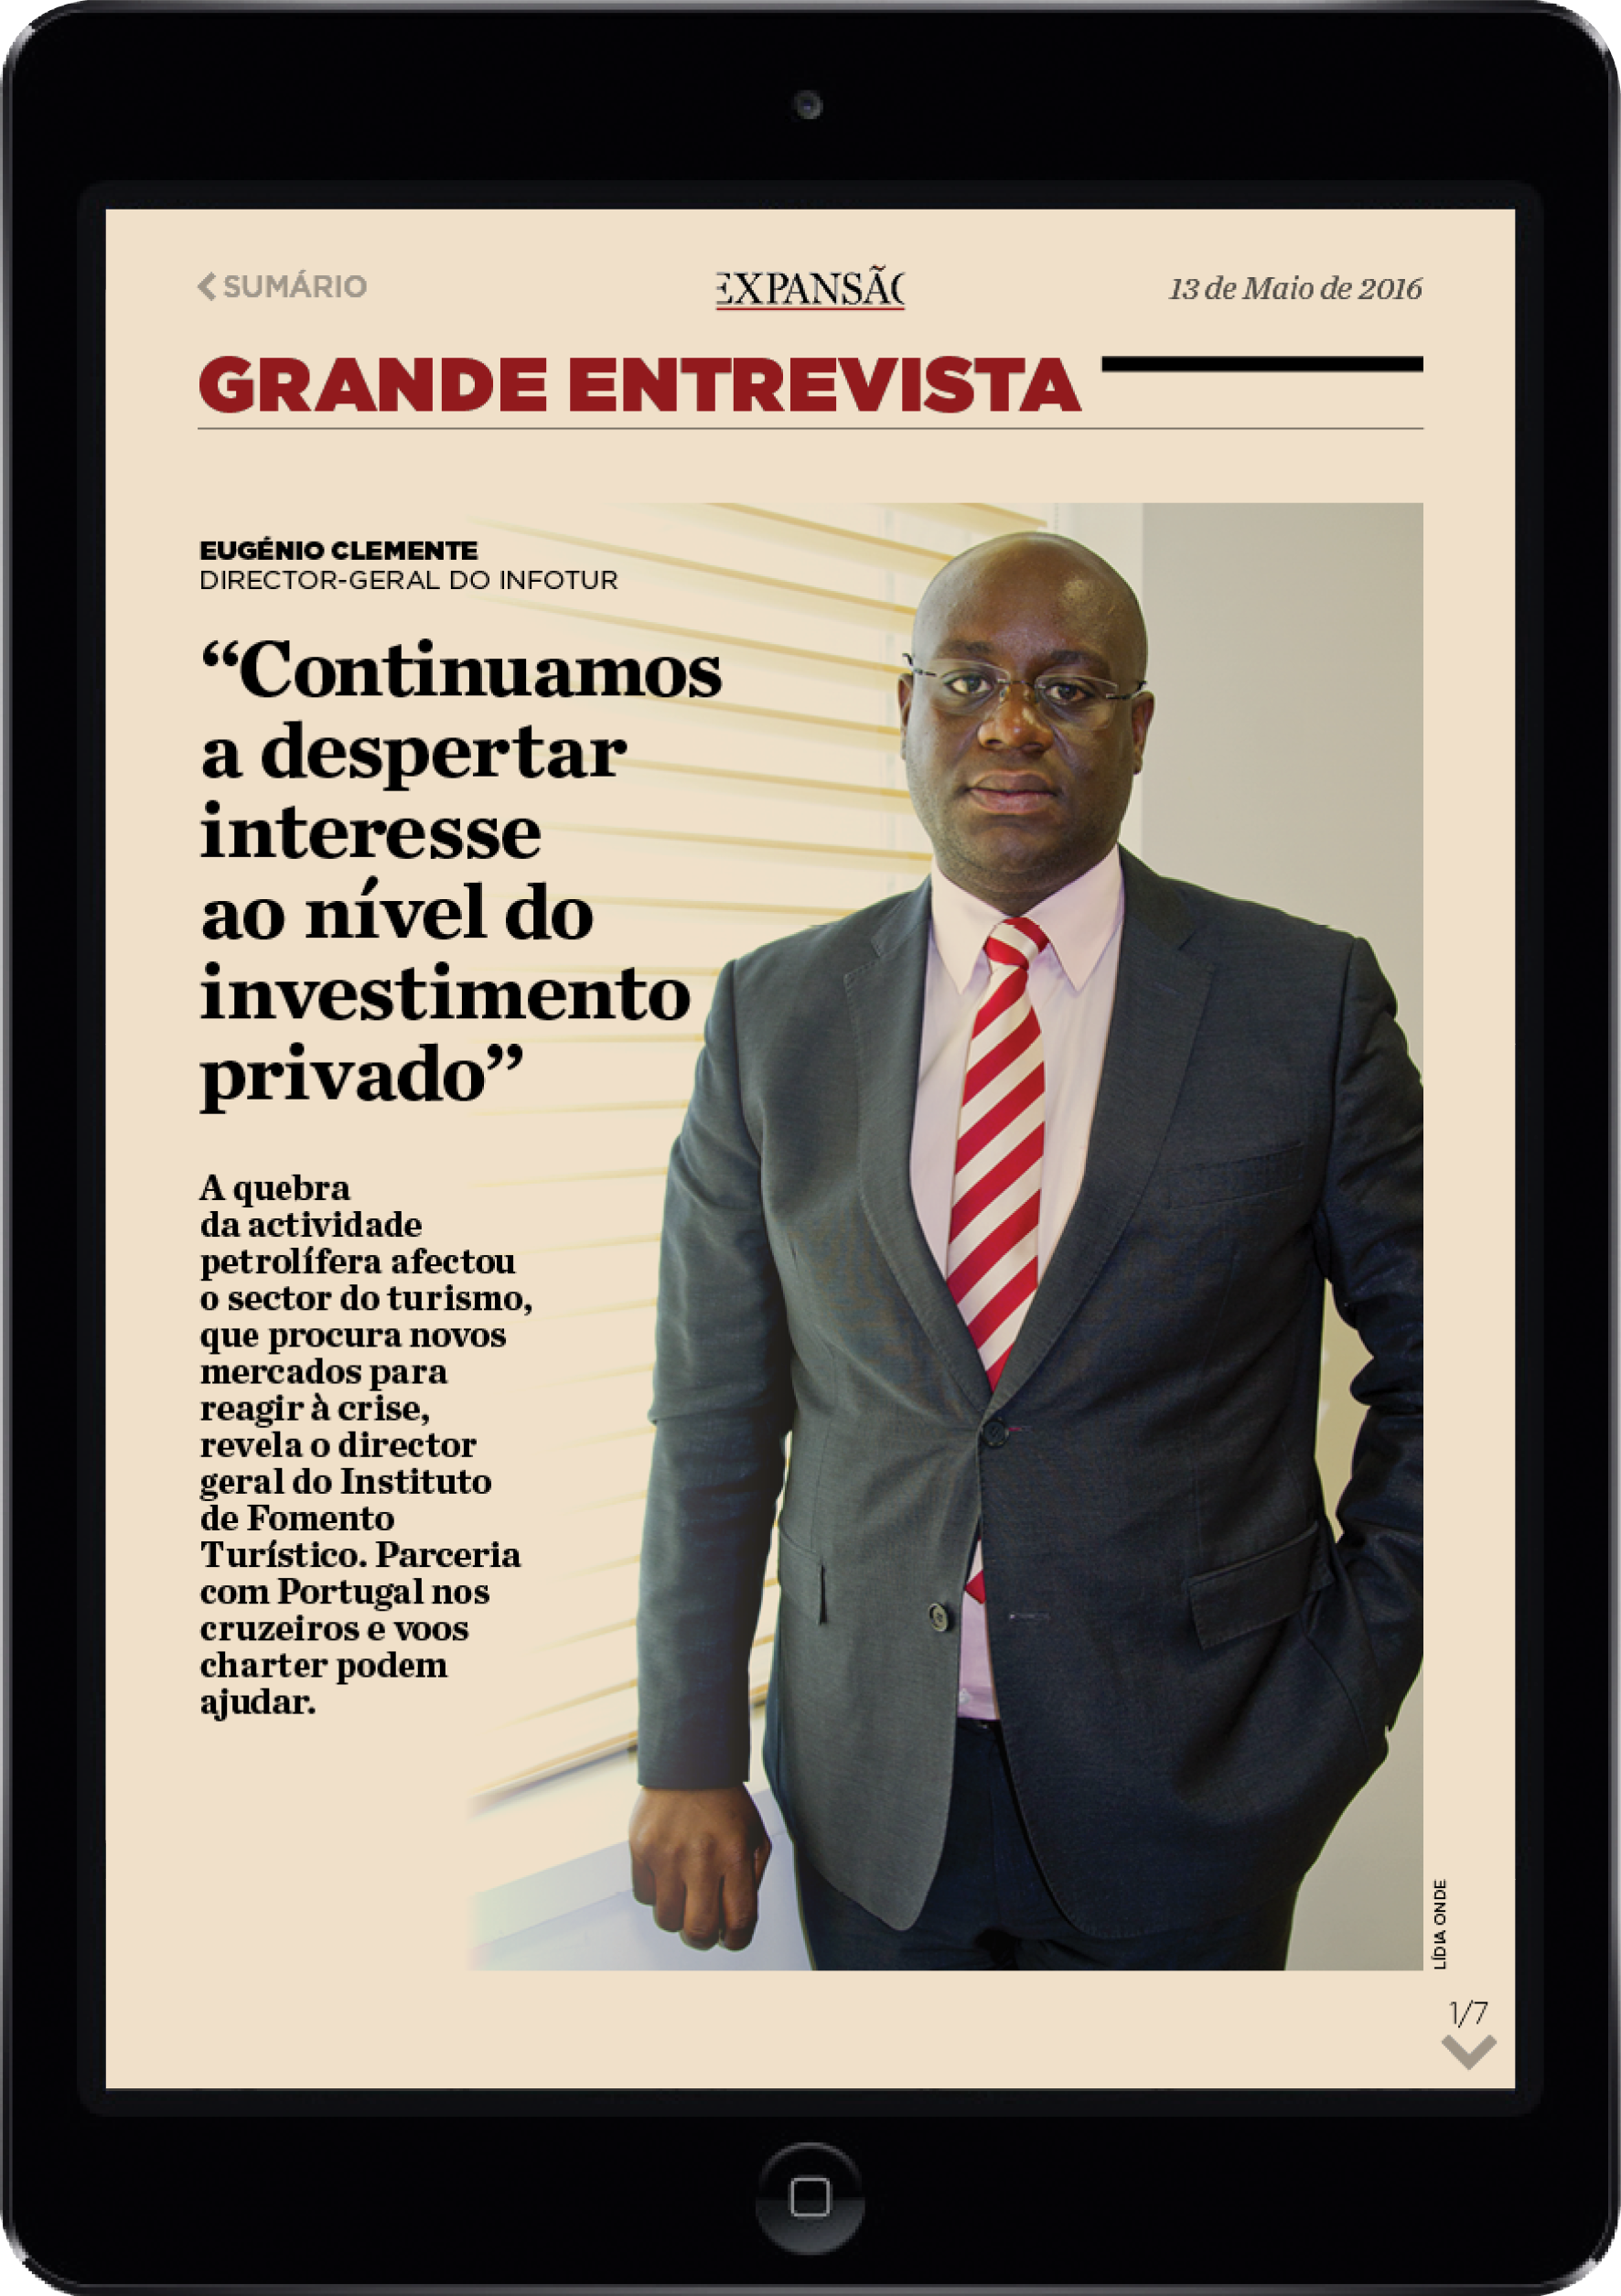 Projecto tablet jornal Expansão – jribeiro